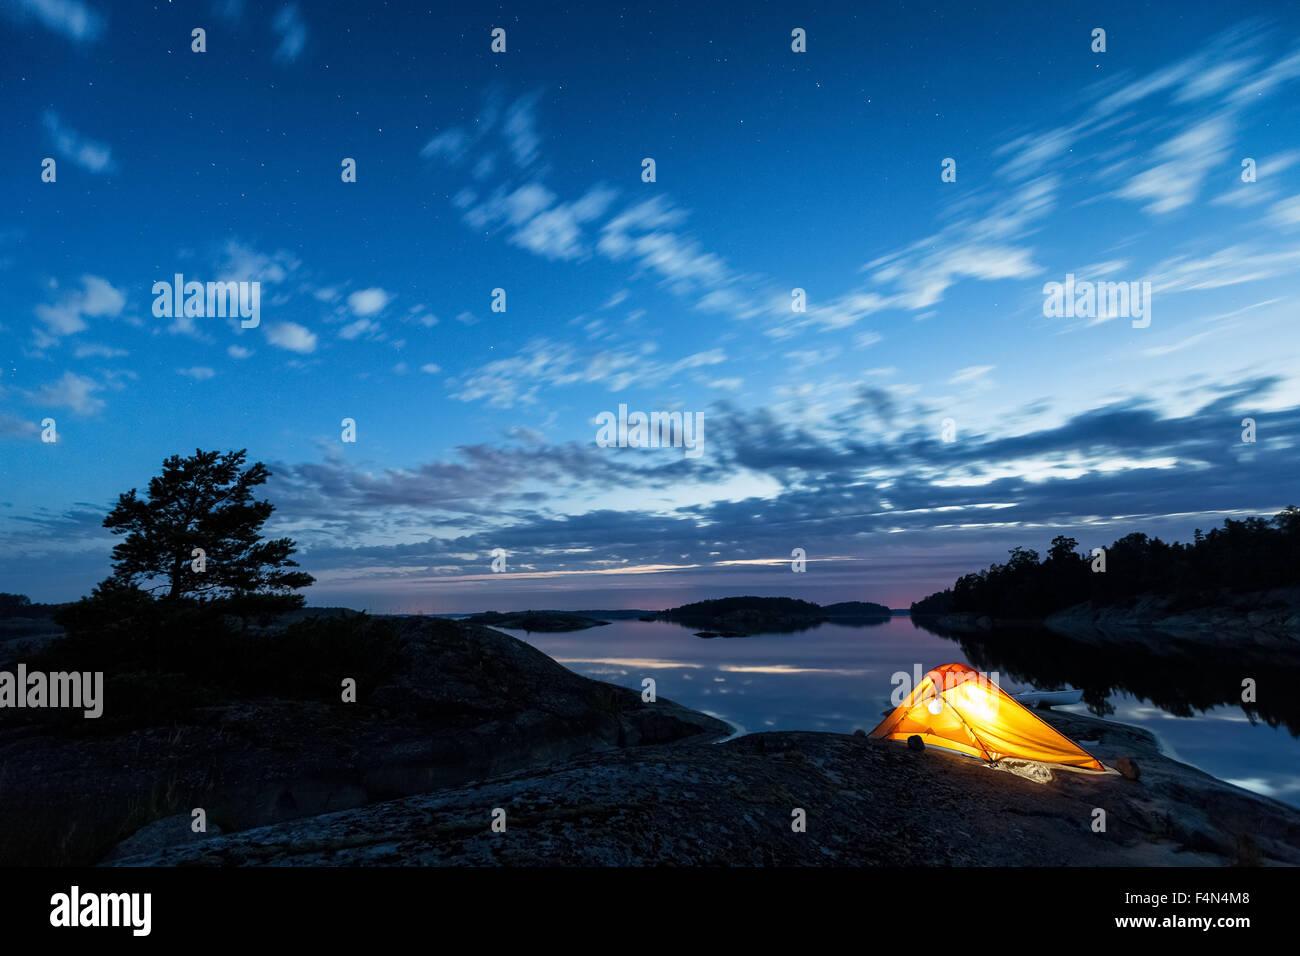 Camping at Tammisaari archipelago, Tammisaari, Finland, Europe, EU - Stock Image